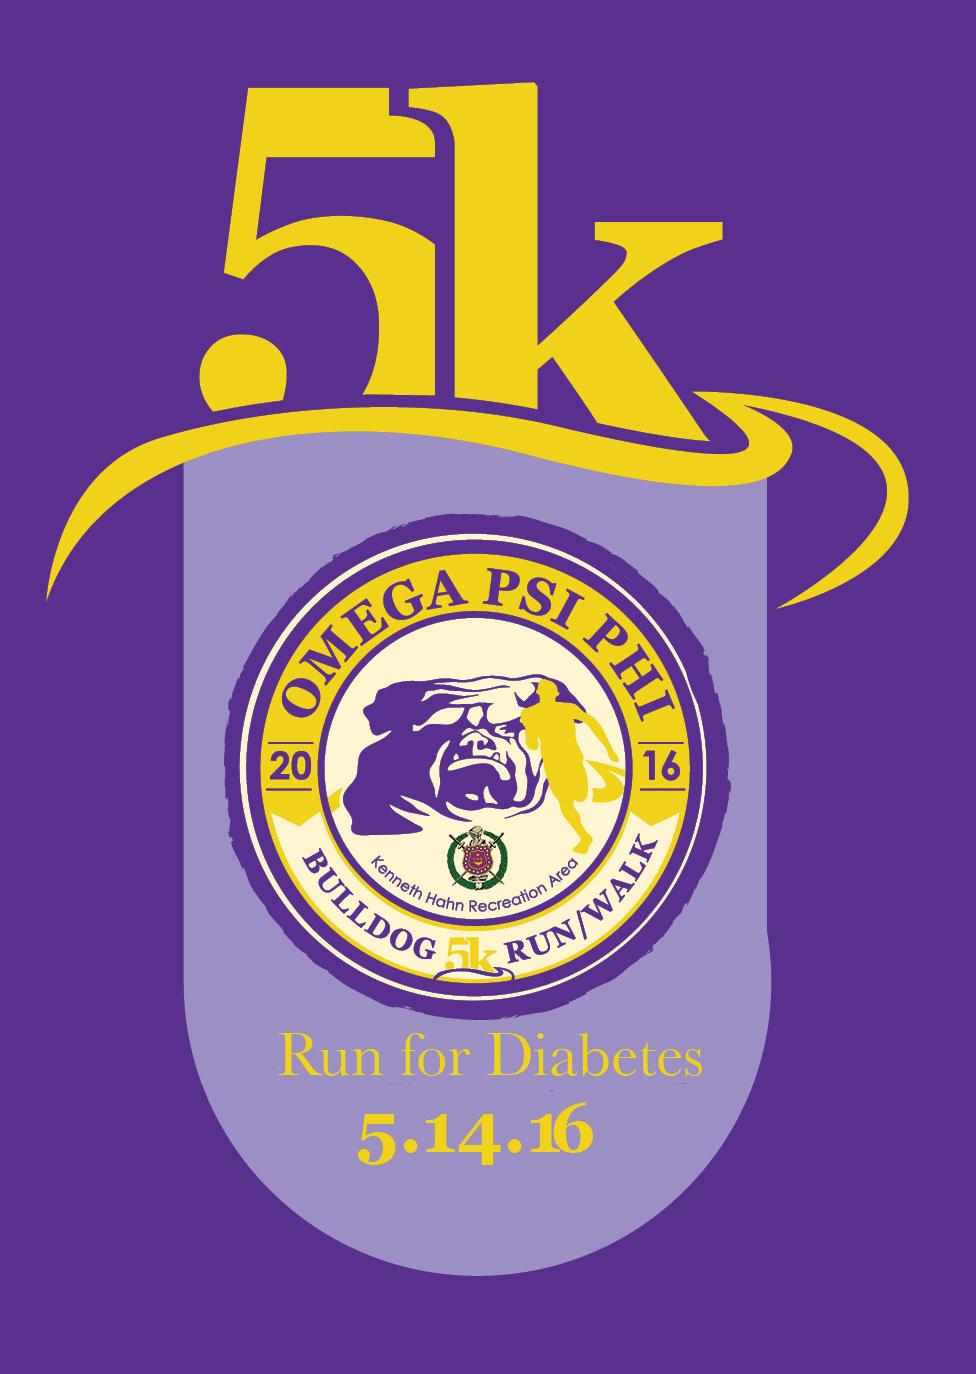 Omega Psi Phi 5k Bulldog Runwalk For Diabetes Los Angeles Ca